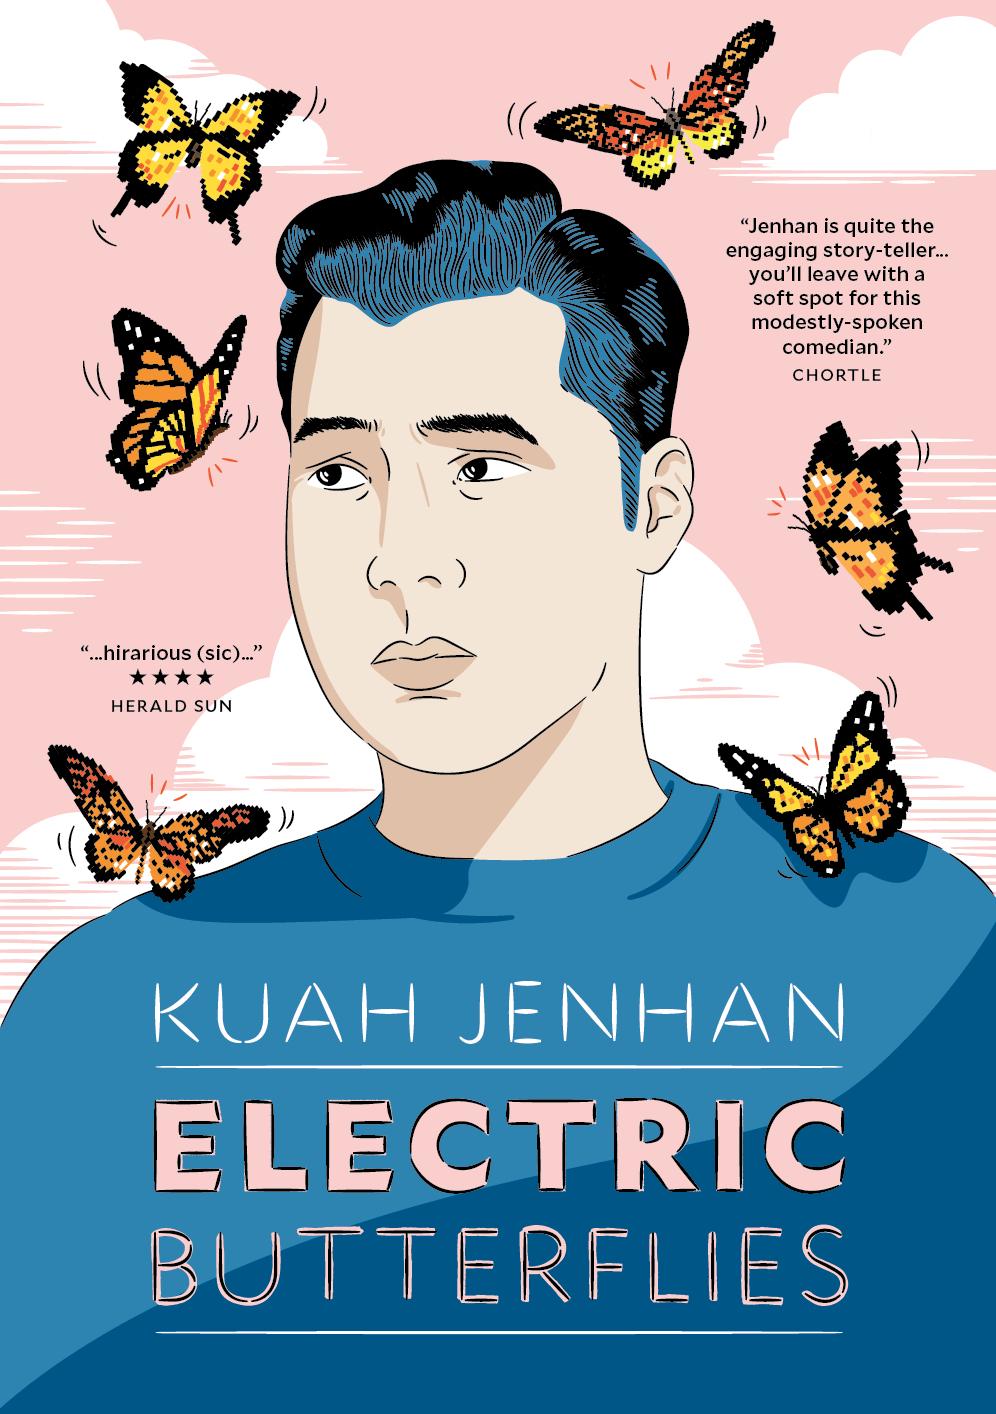 Jenhan_ElectricButterflies_Generic.png